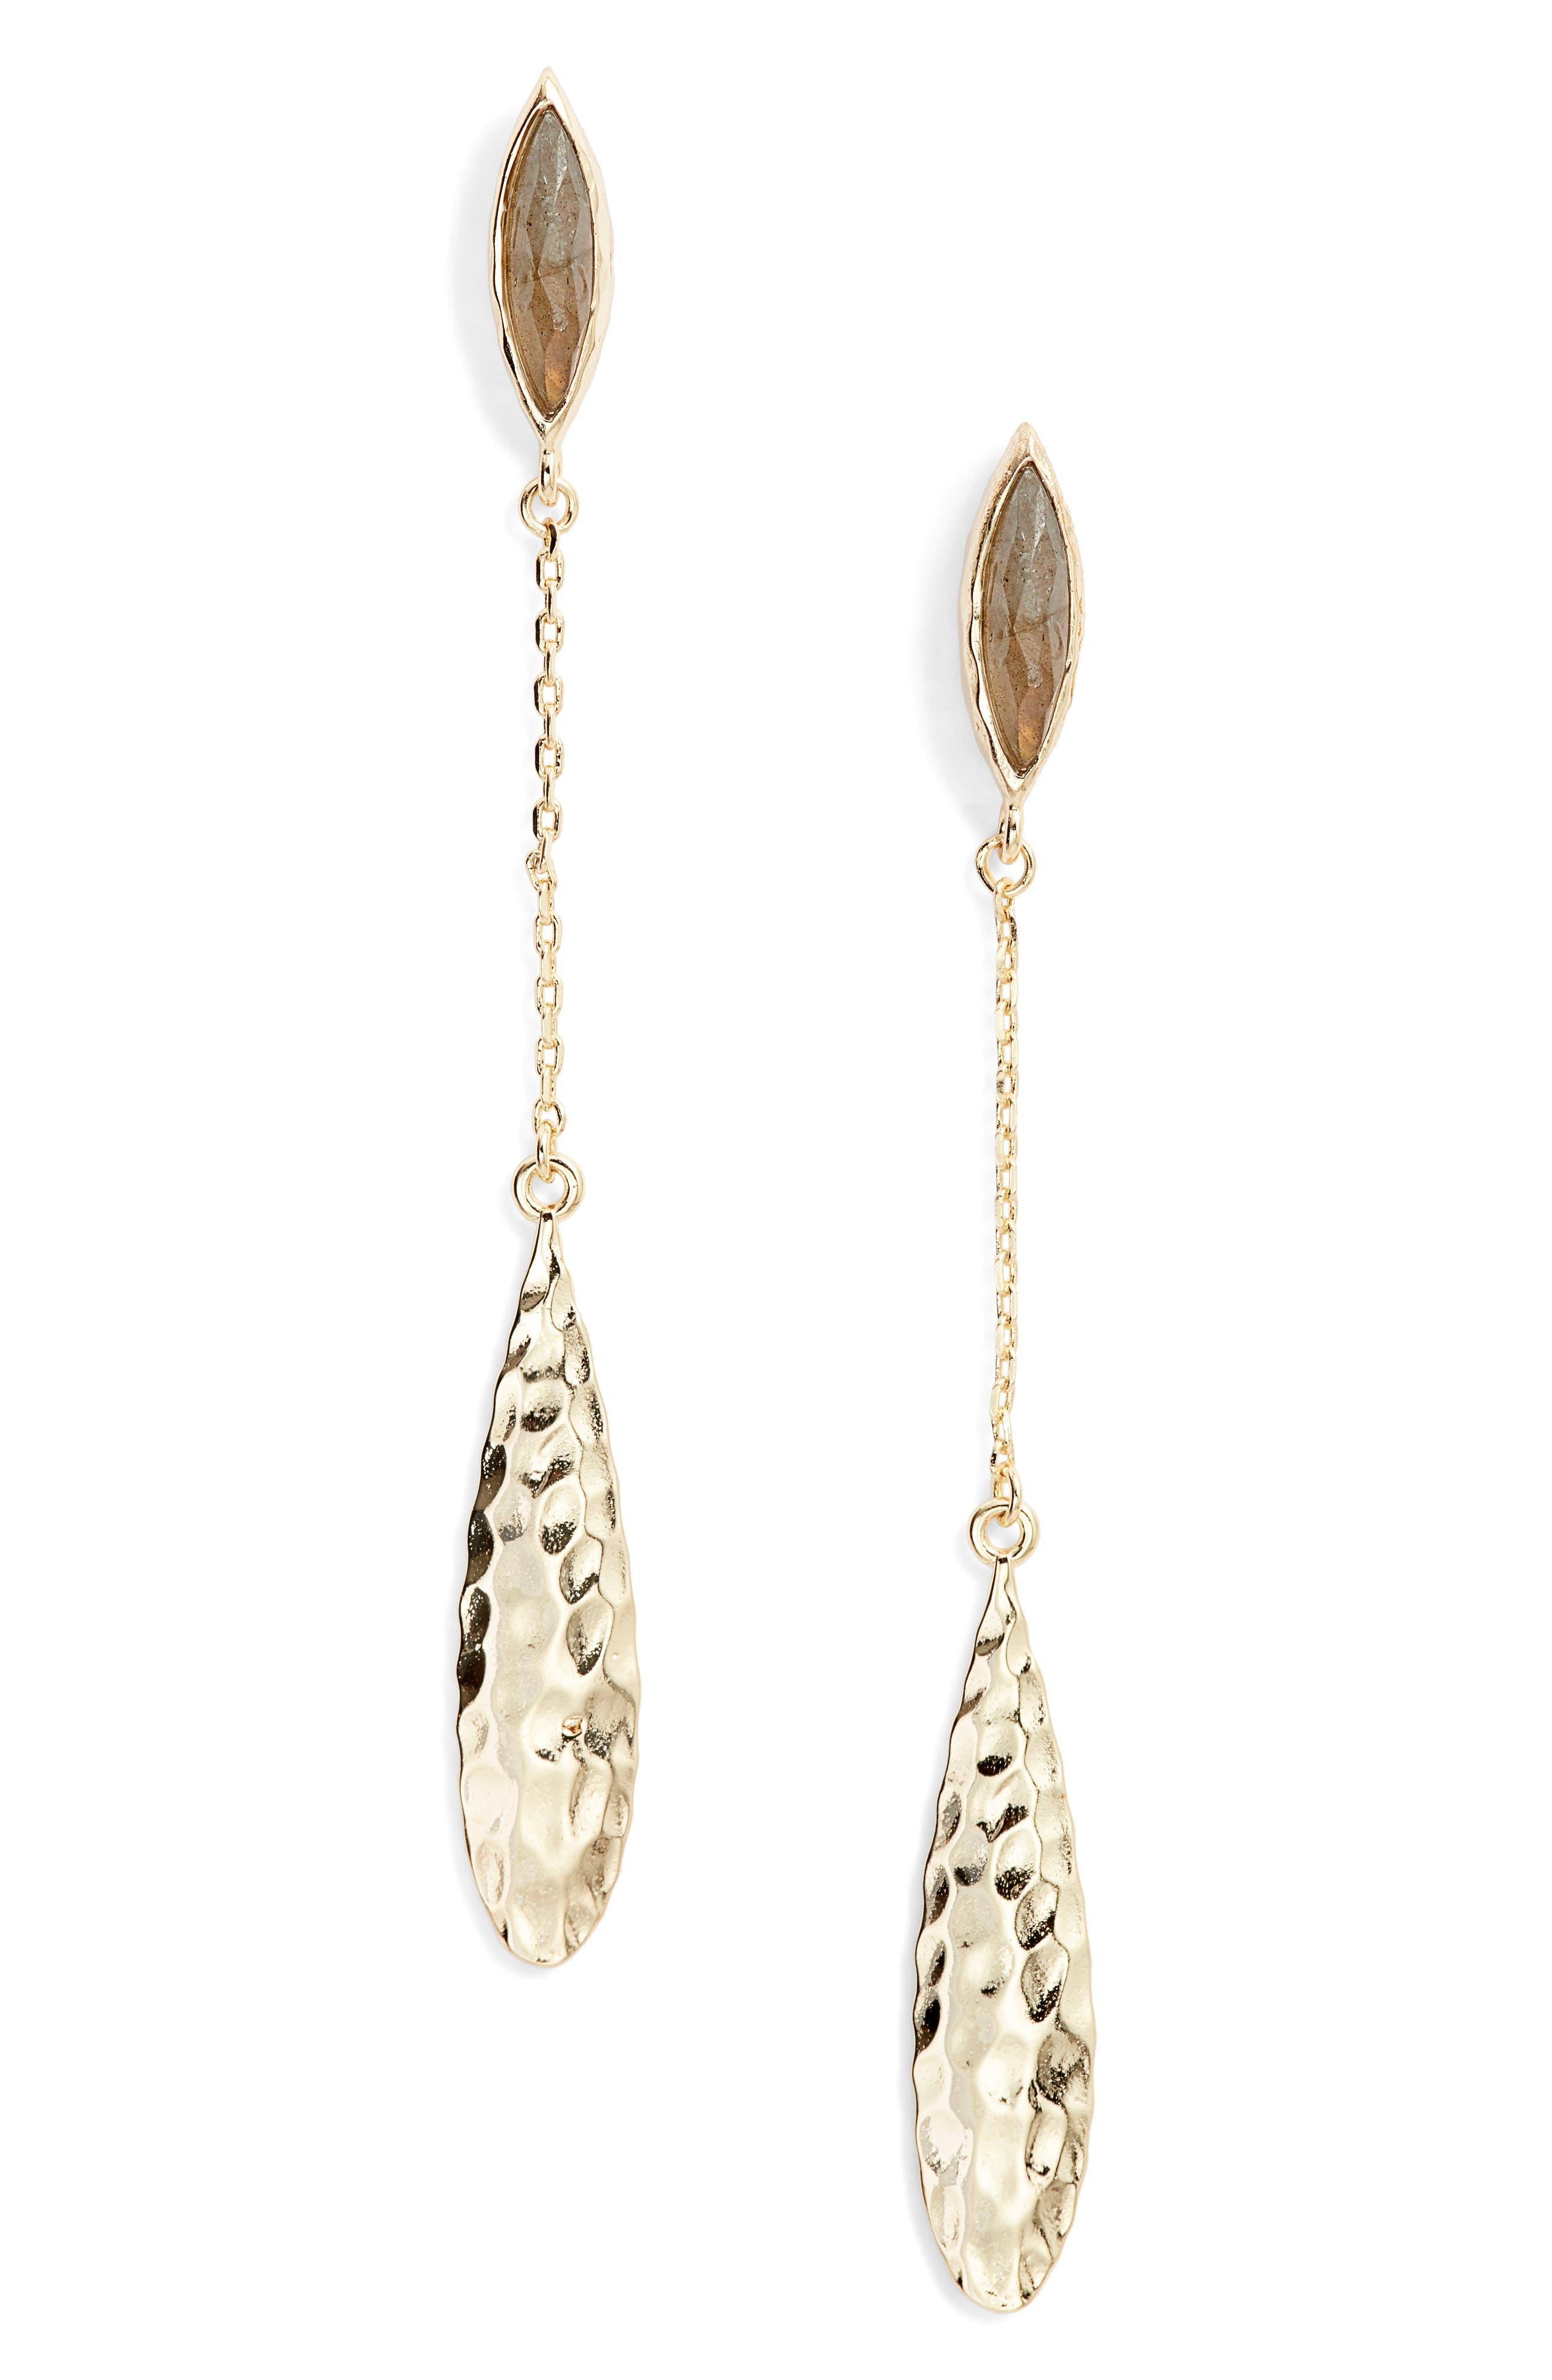 Sliver Labradorite Drop Earrings in Gold/ Labradorite